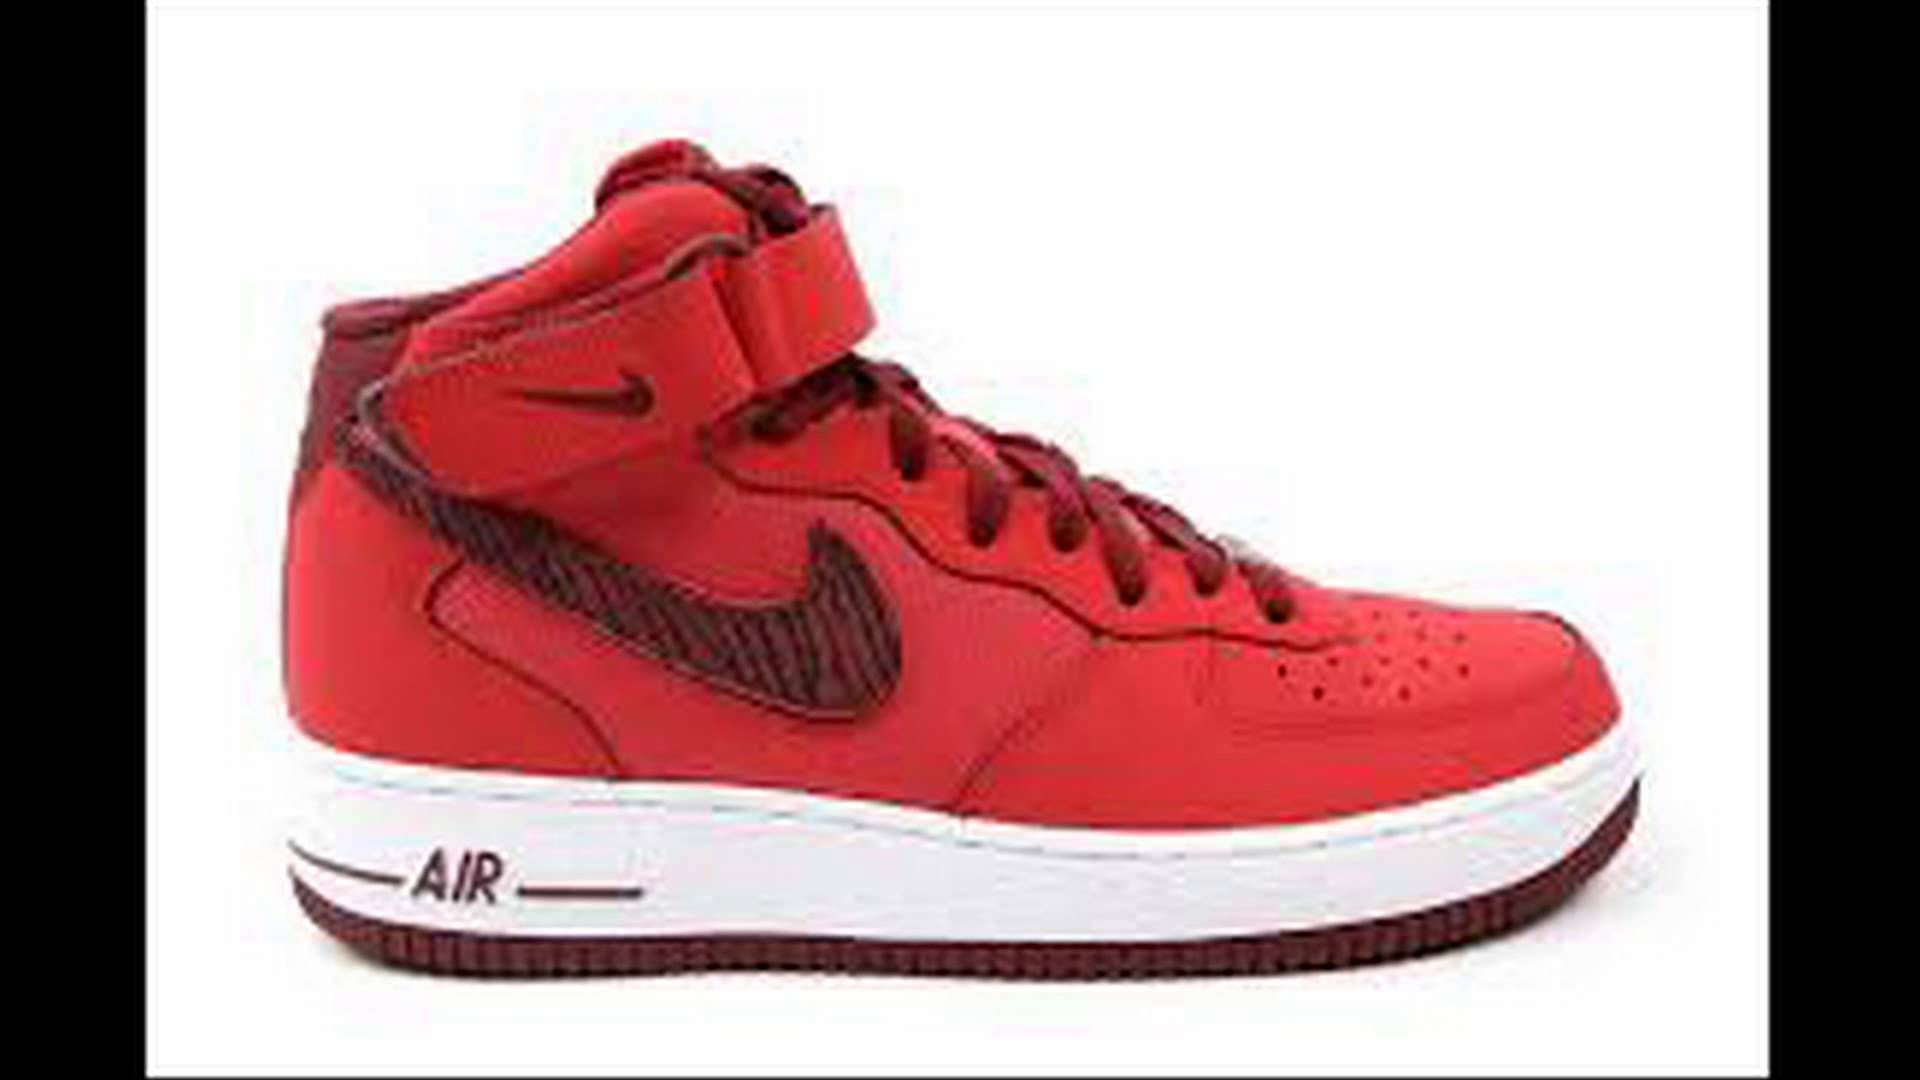 Nike AIR FORCE 1 MID '07 Spor Ayakkabı Modelleri http